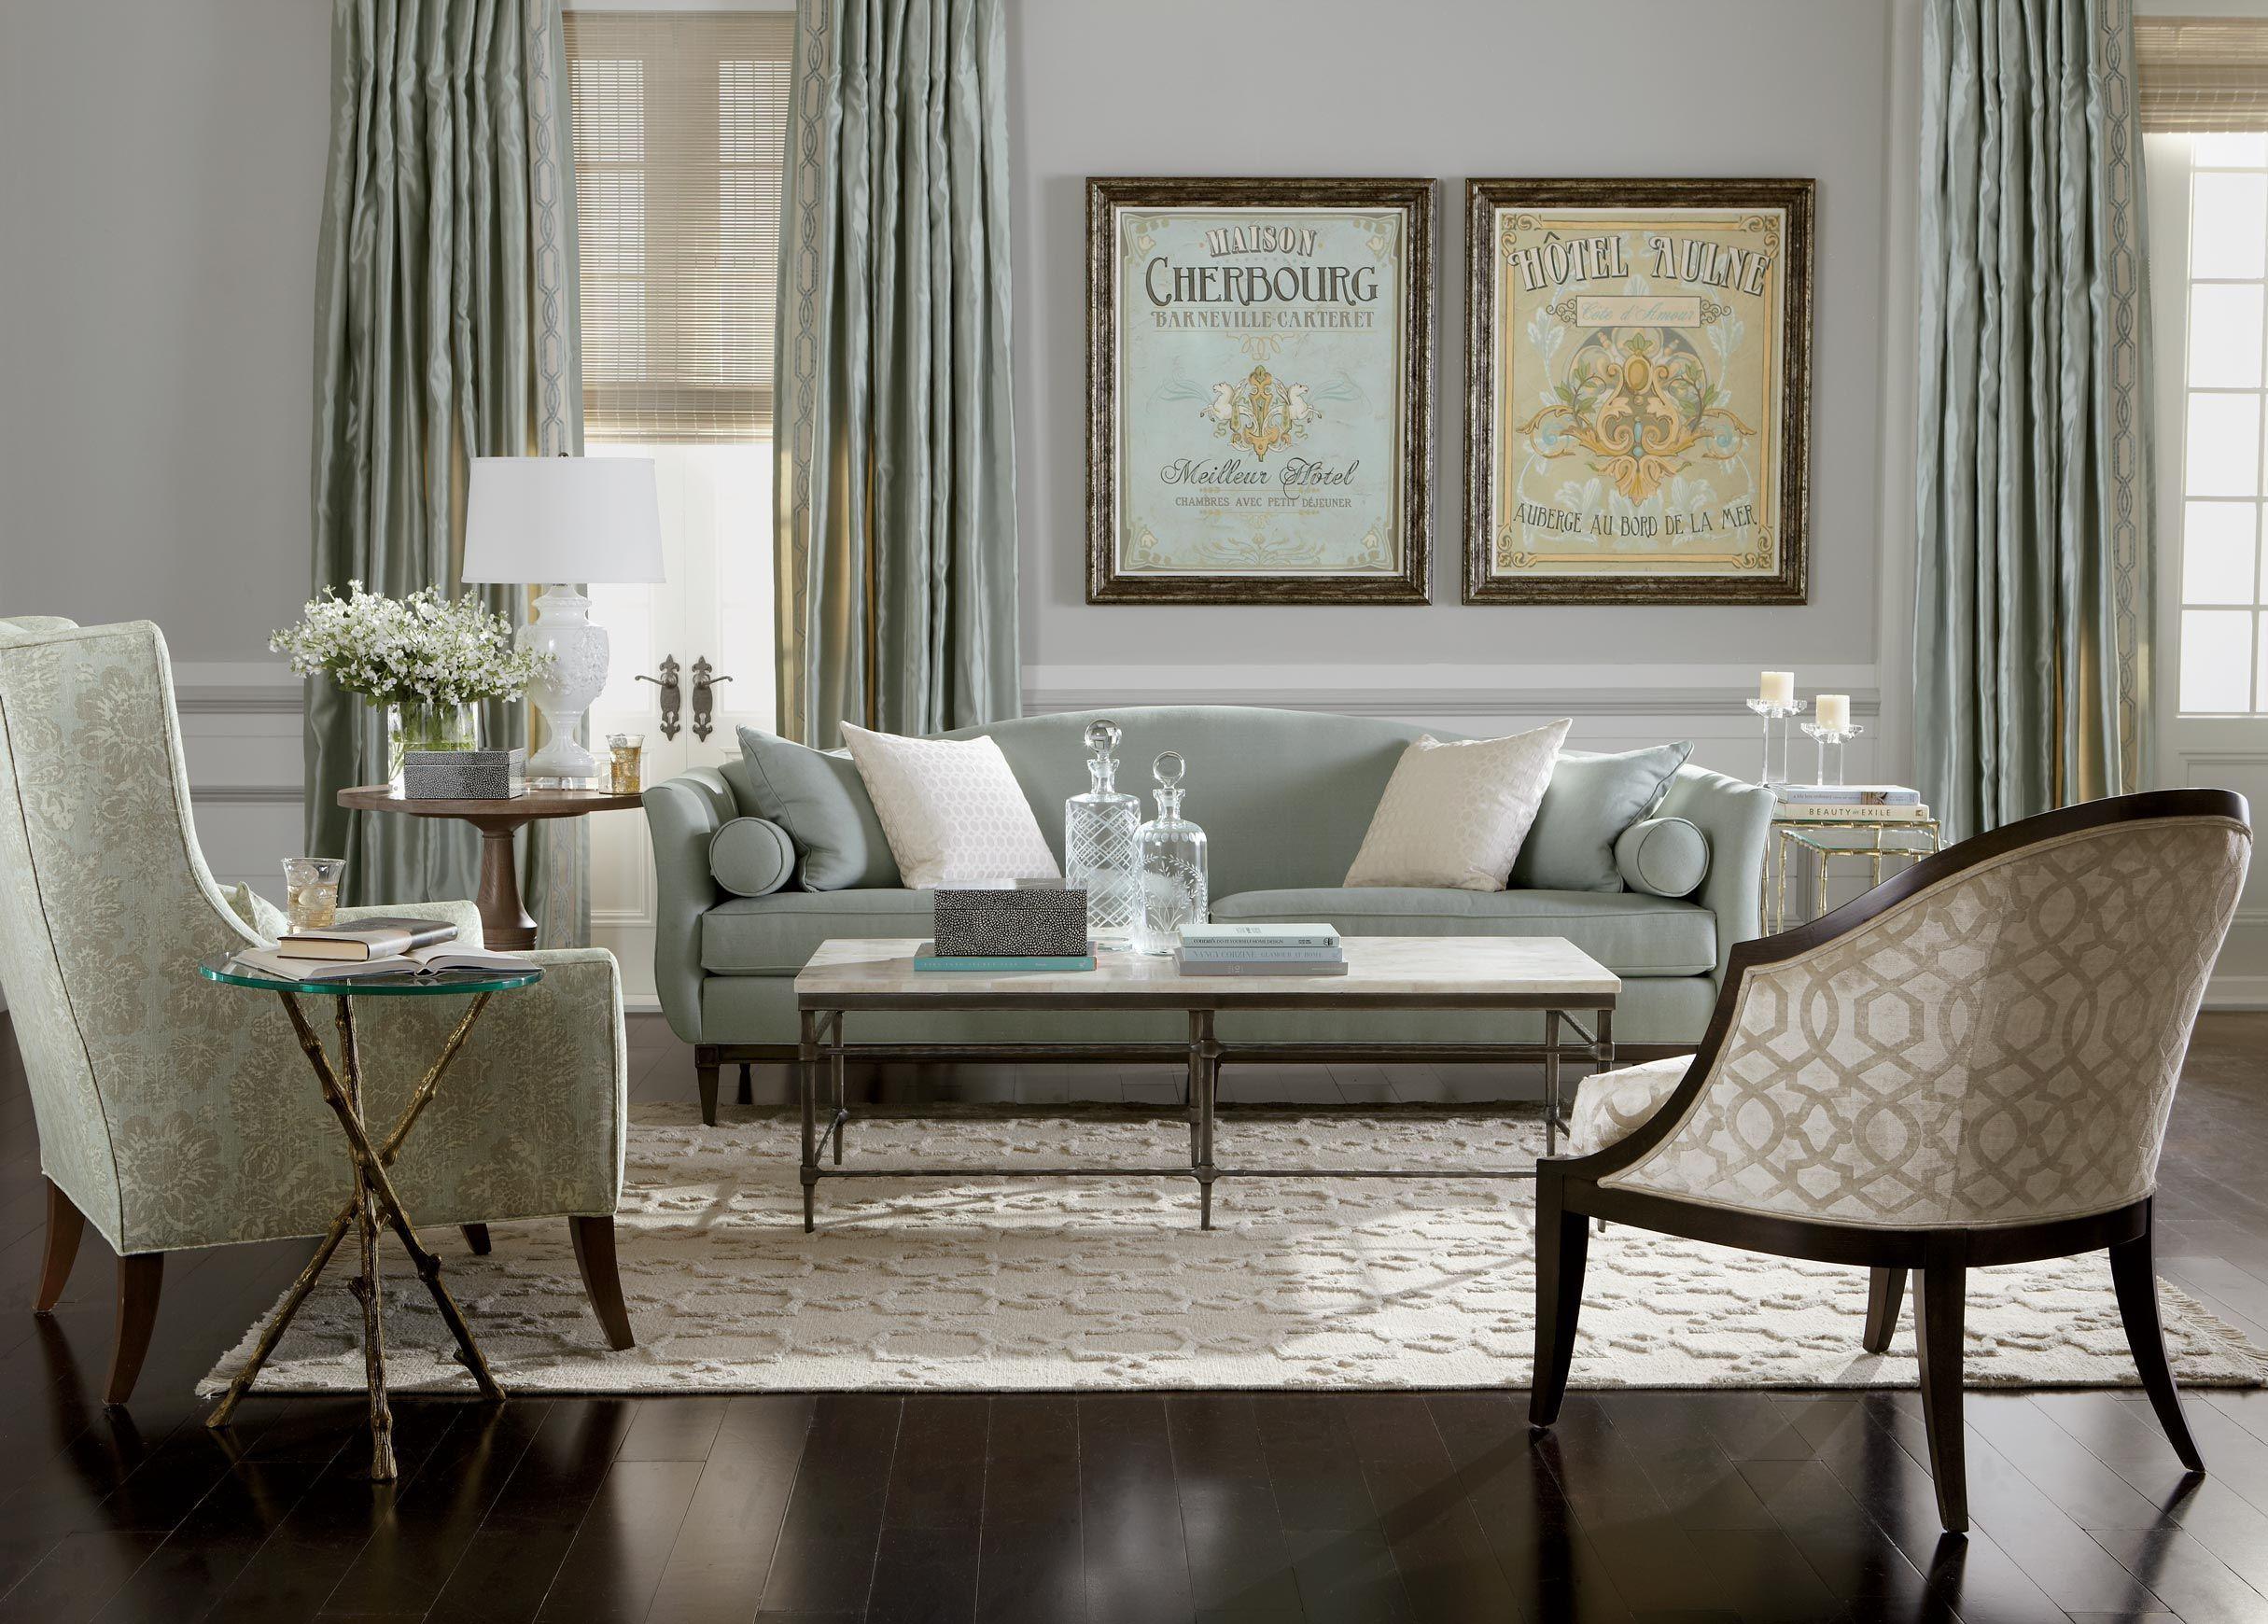 Living room ideas ethan allen ethanallen house redecoration in